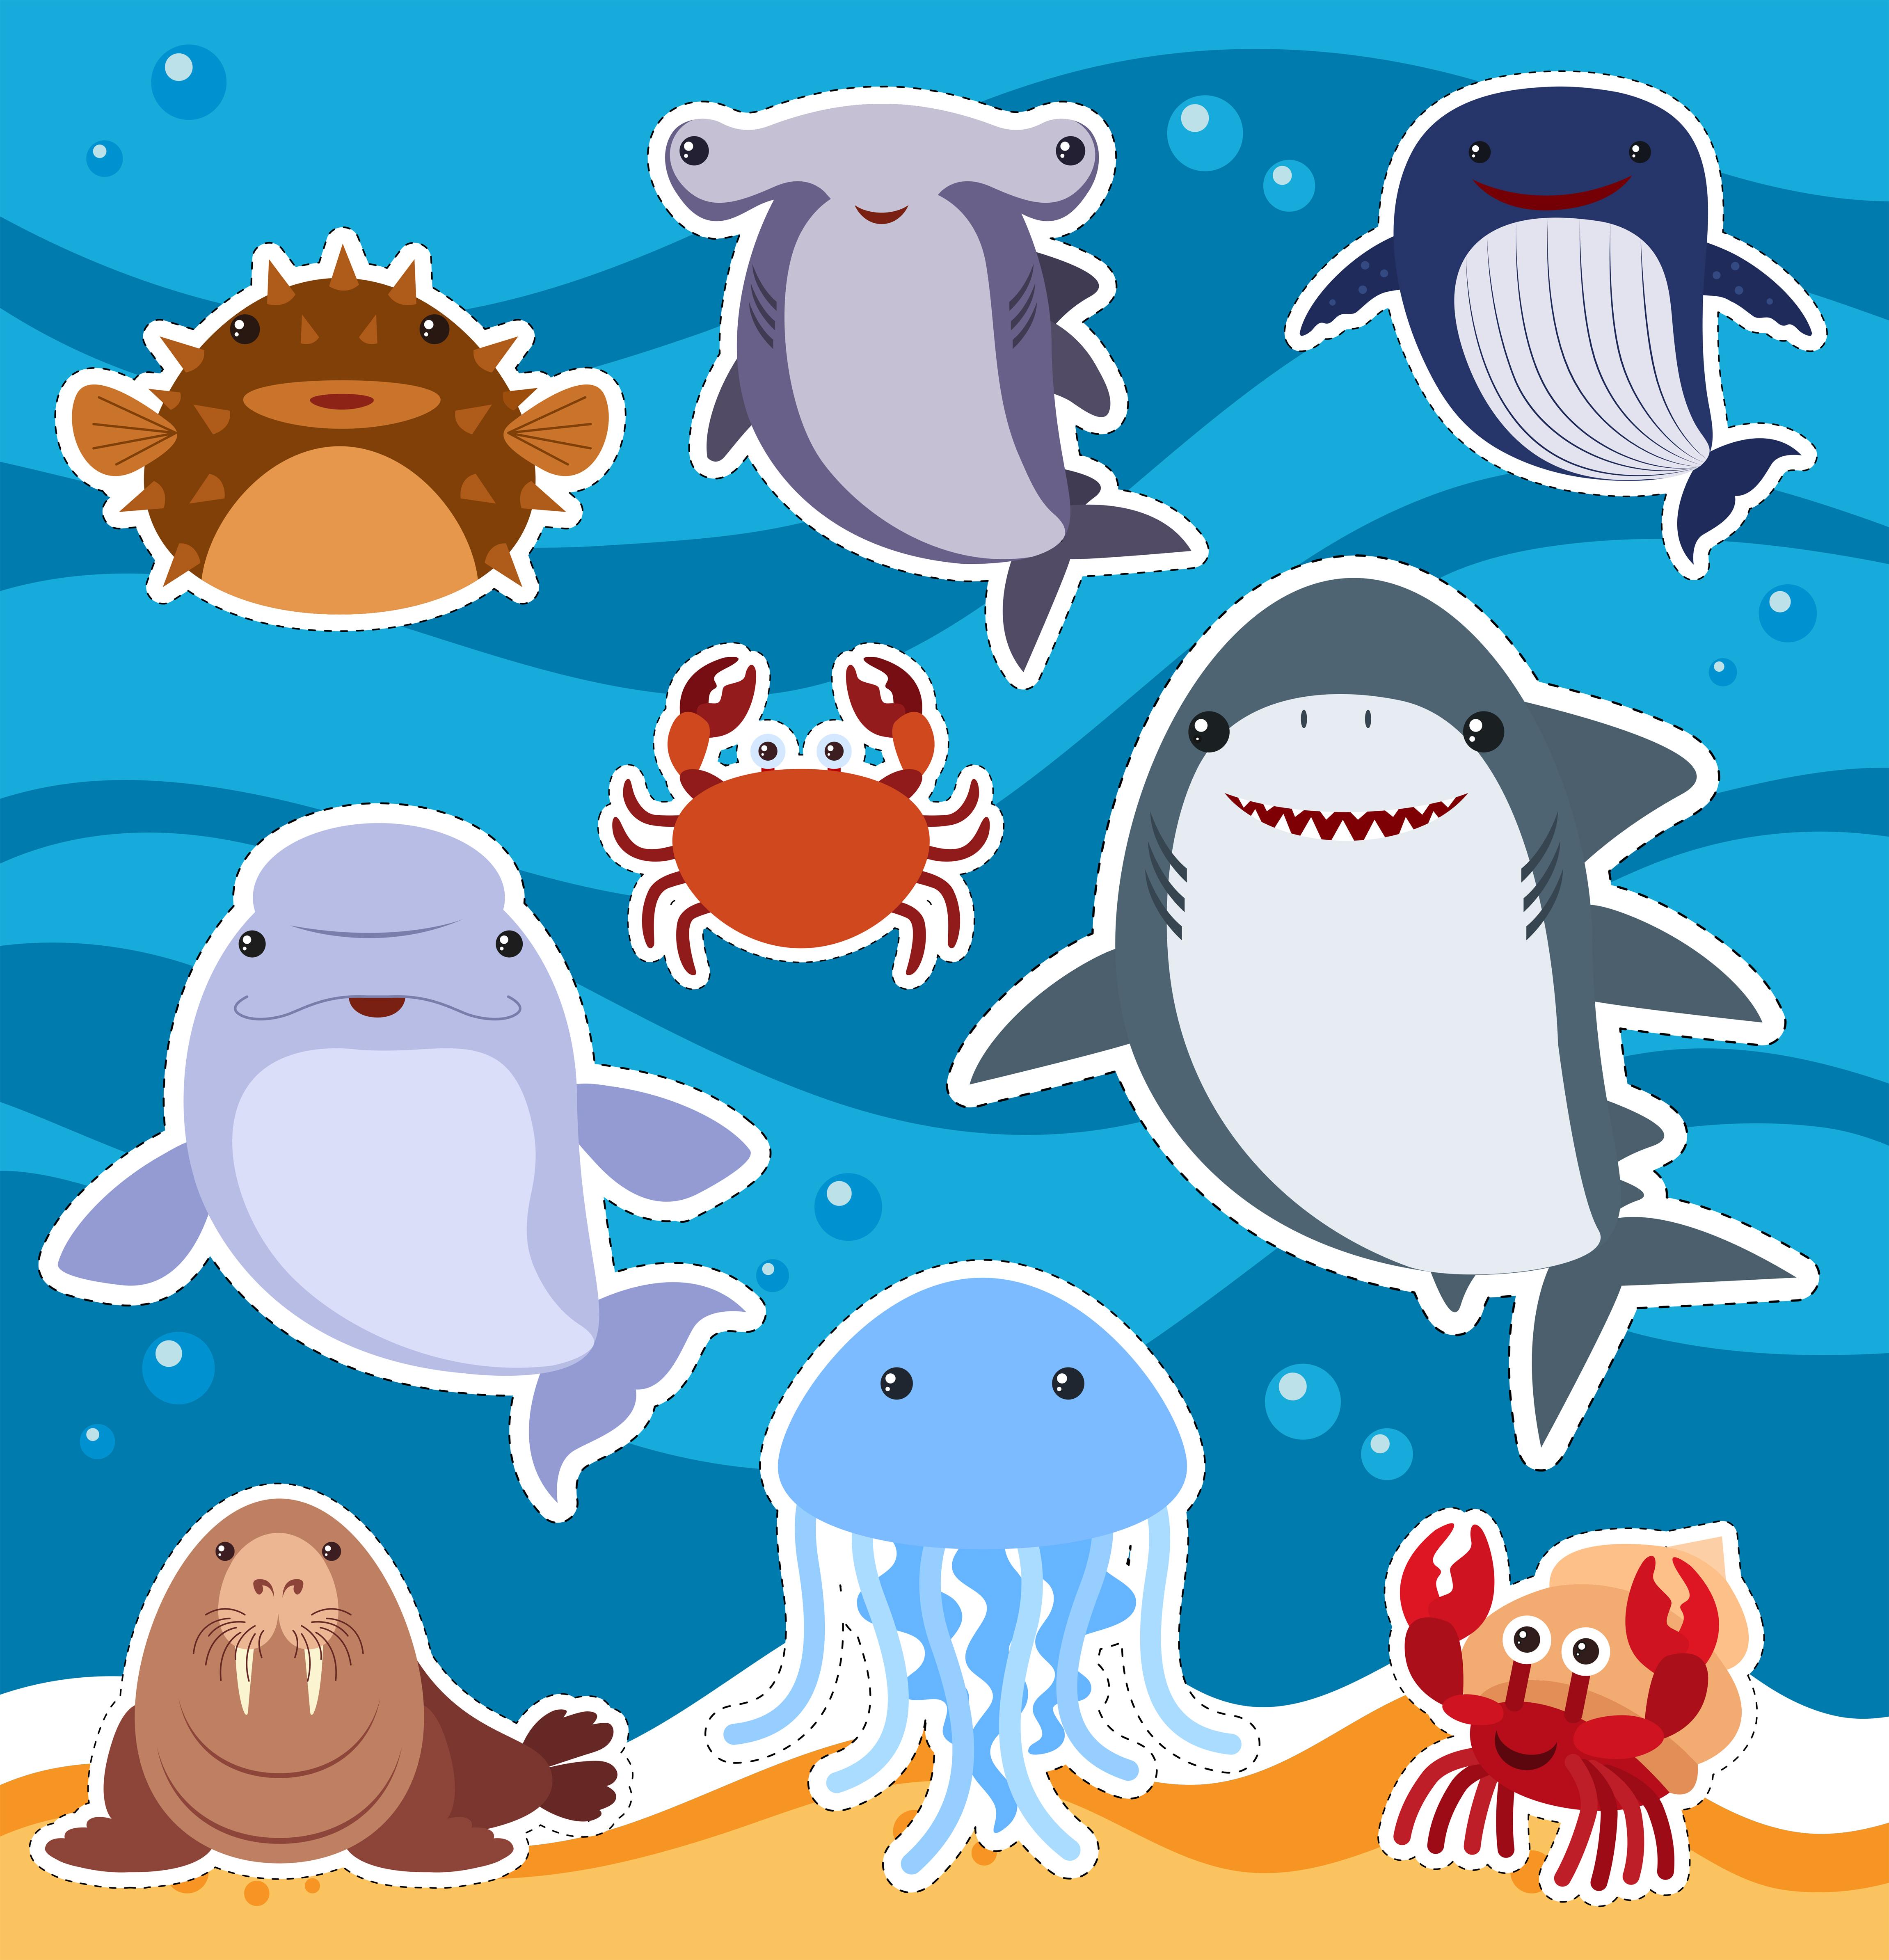 Sticker Design With Cute Sea Animals 303223 Vector Art At Vecteezy